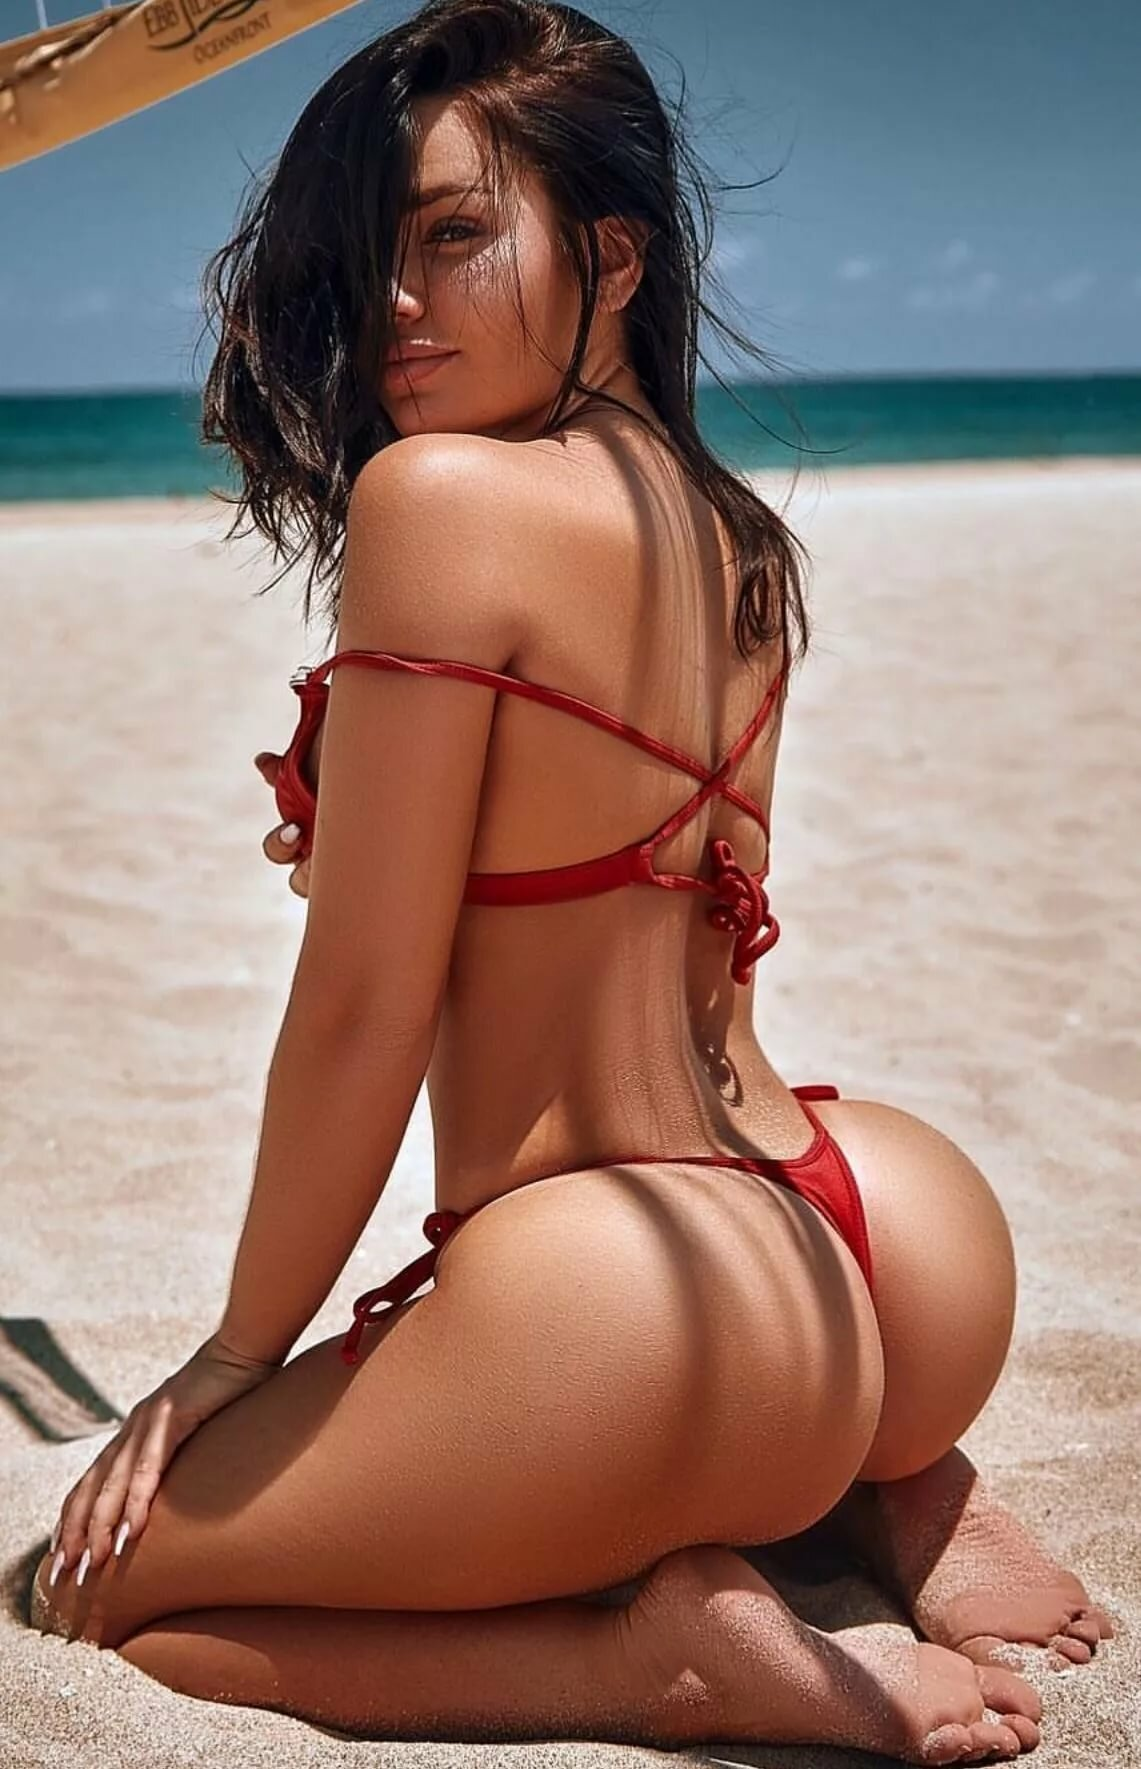 Girls brunette bikini butt